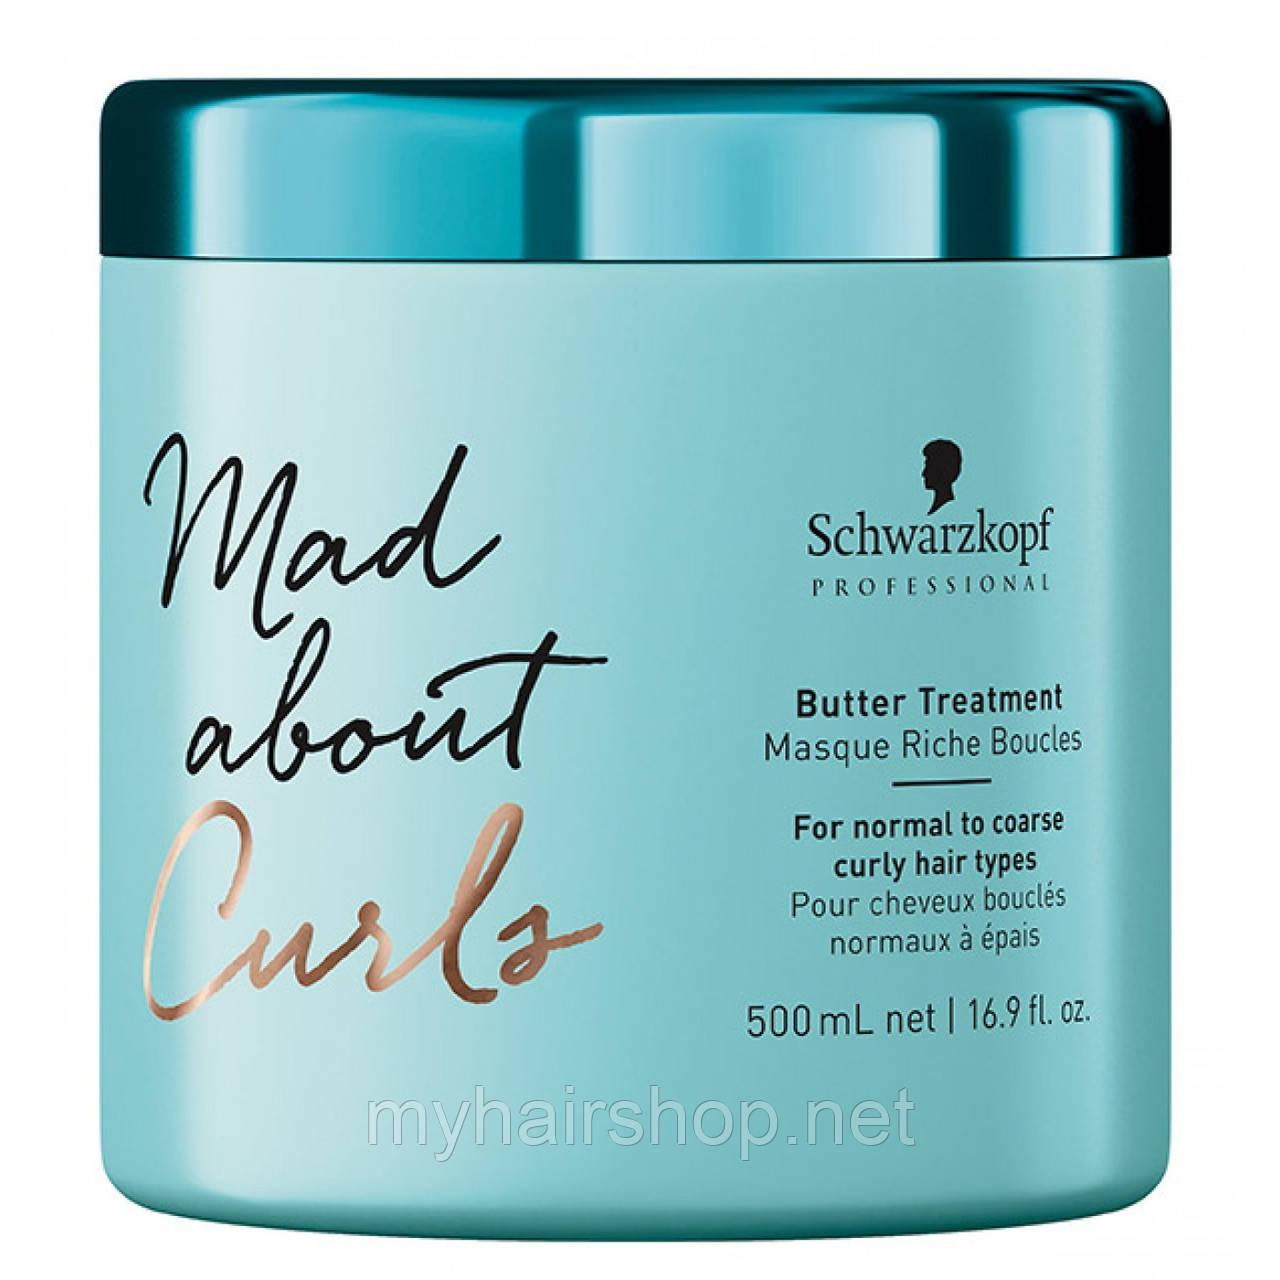 Интенсивная маска для вьющихся волос SCHWARZKOPF Mad About Curls Butter Treatment 500 мл